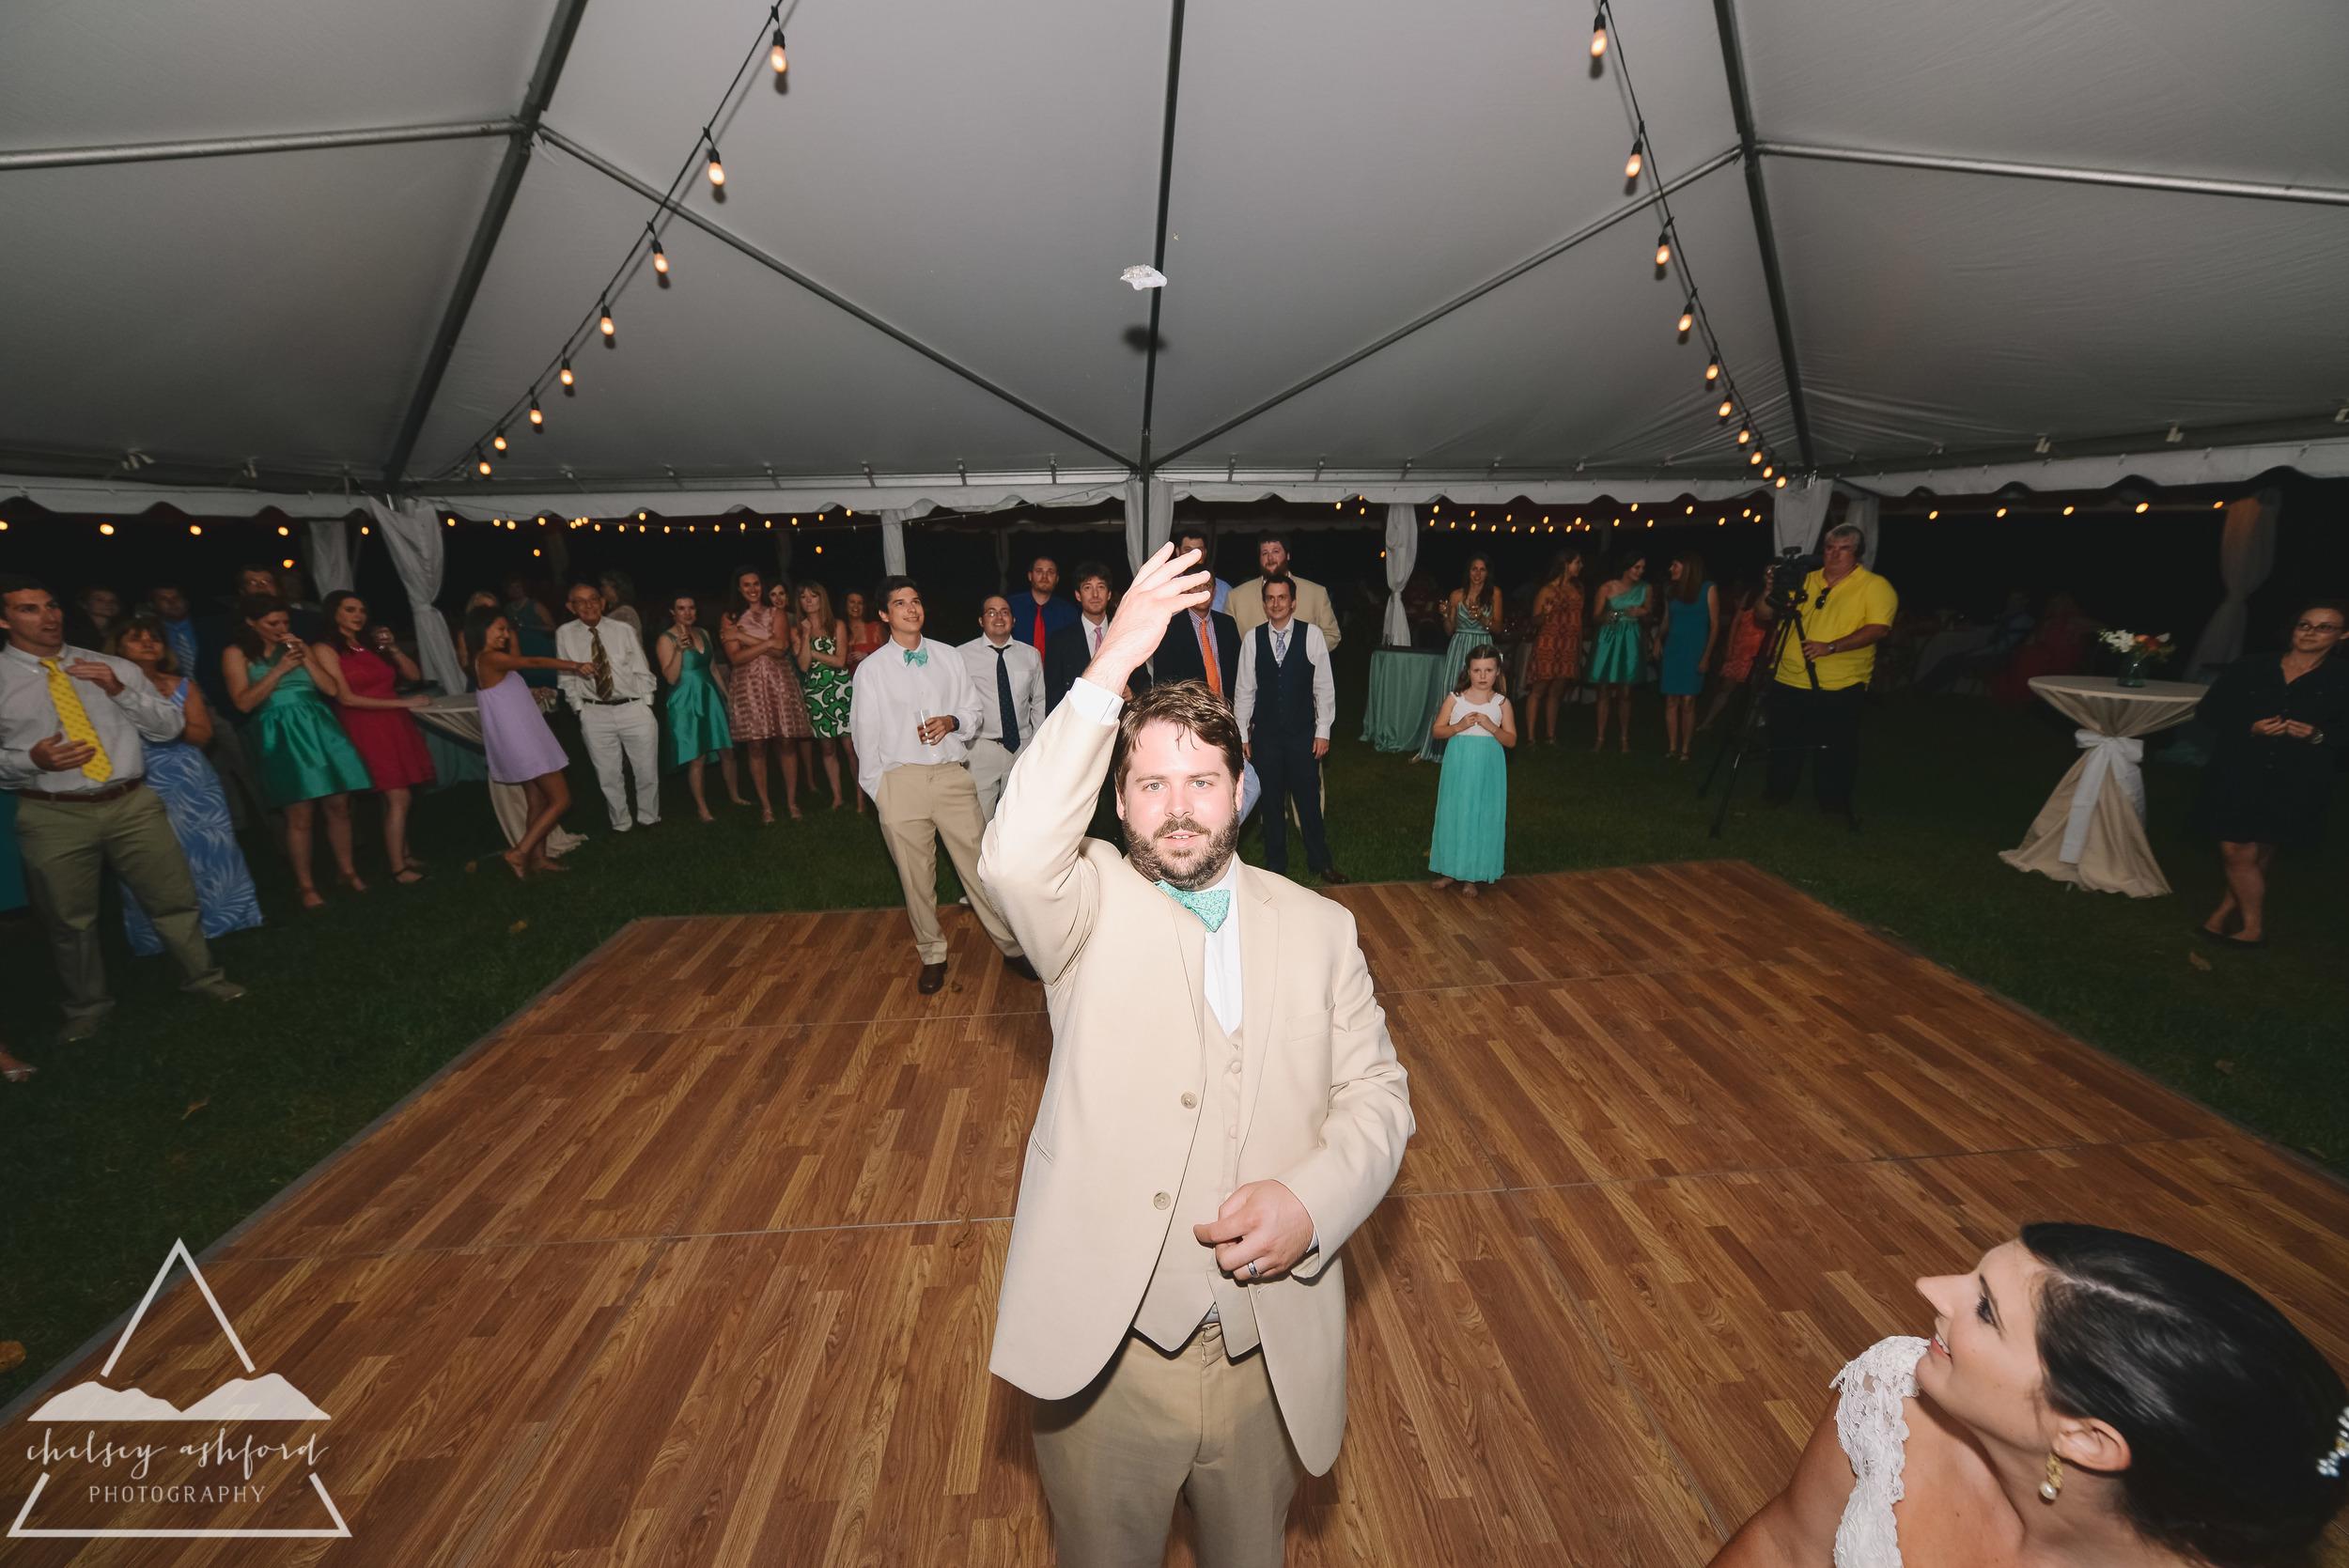 Clarkson_wedding_web-190.jpg